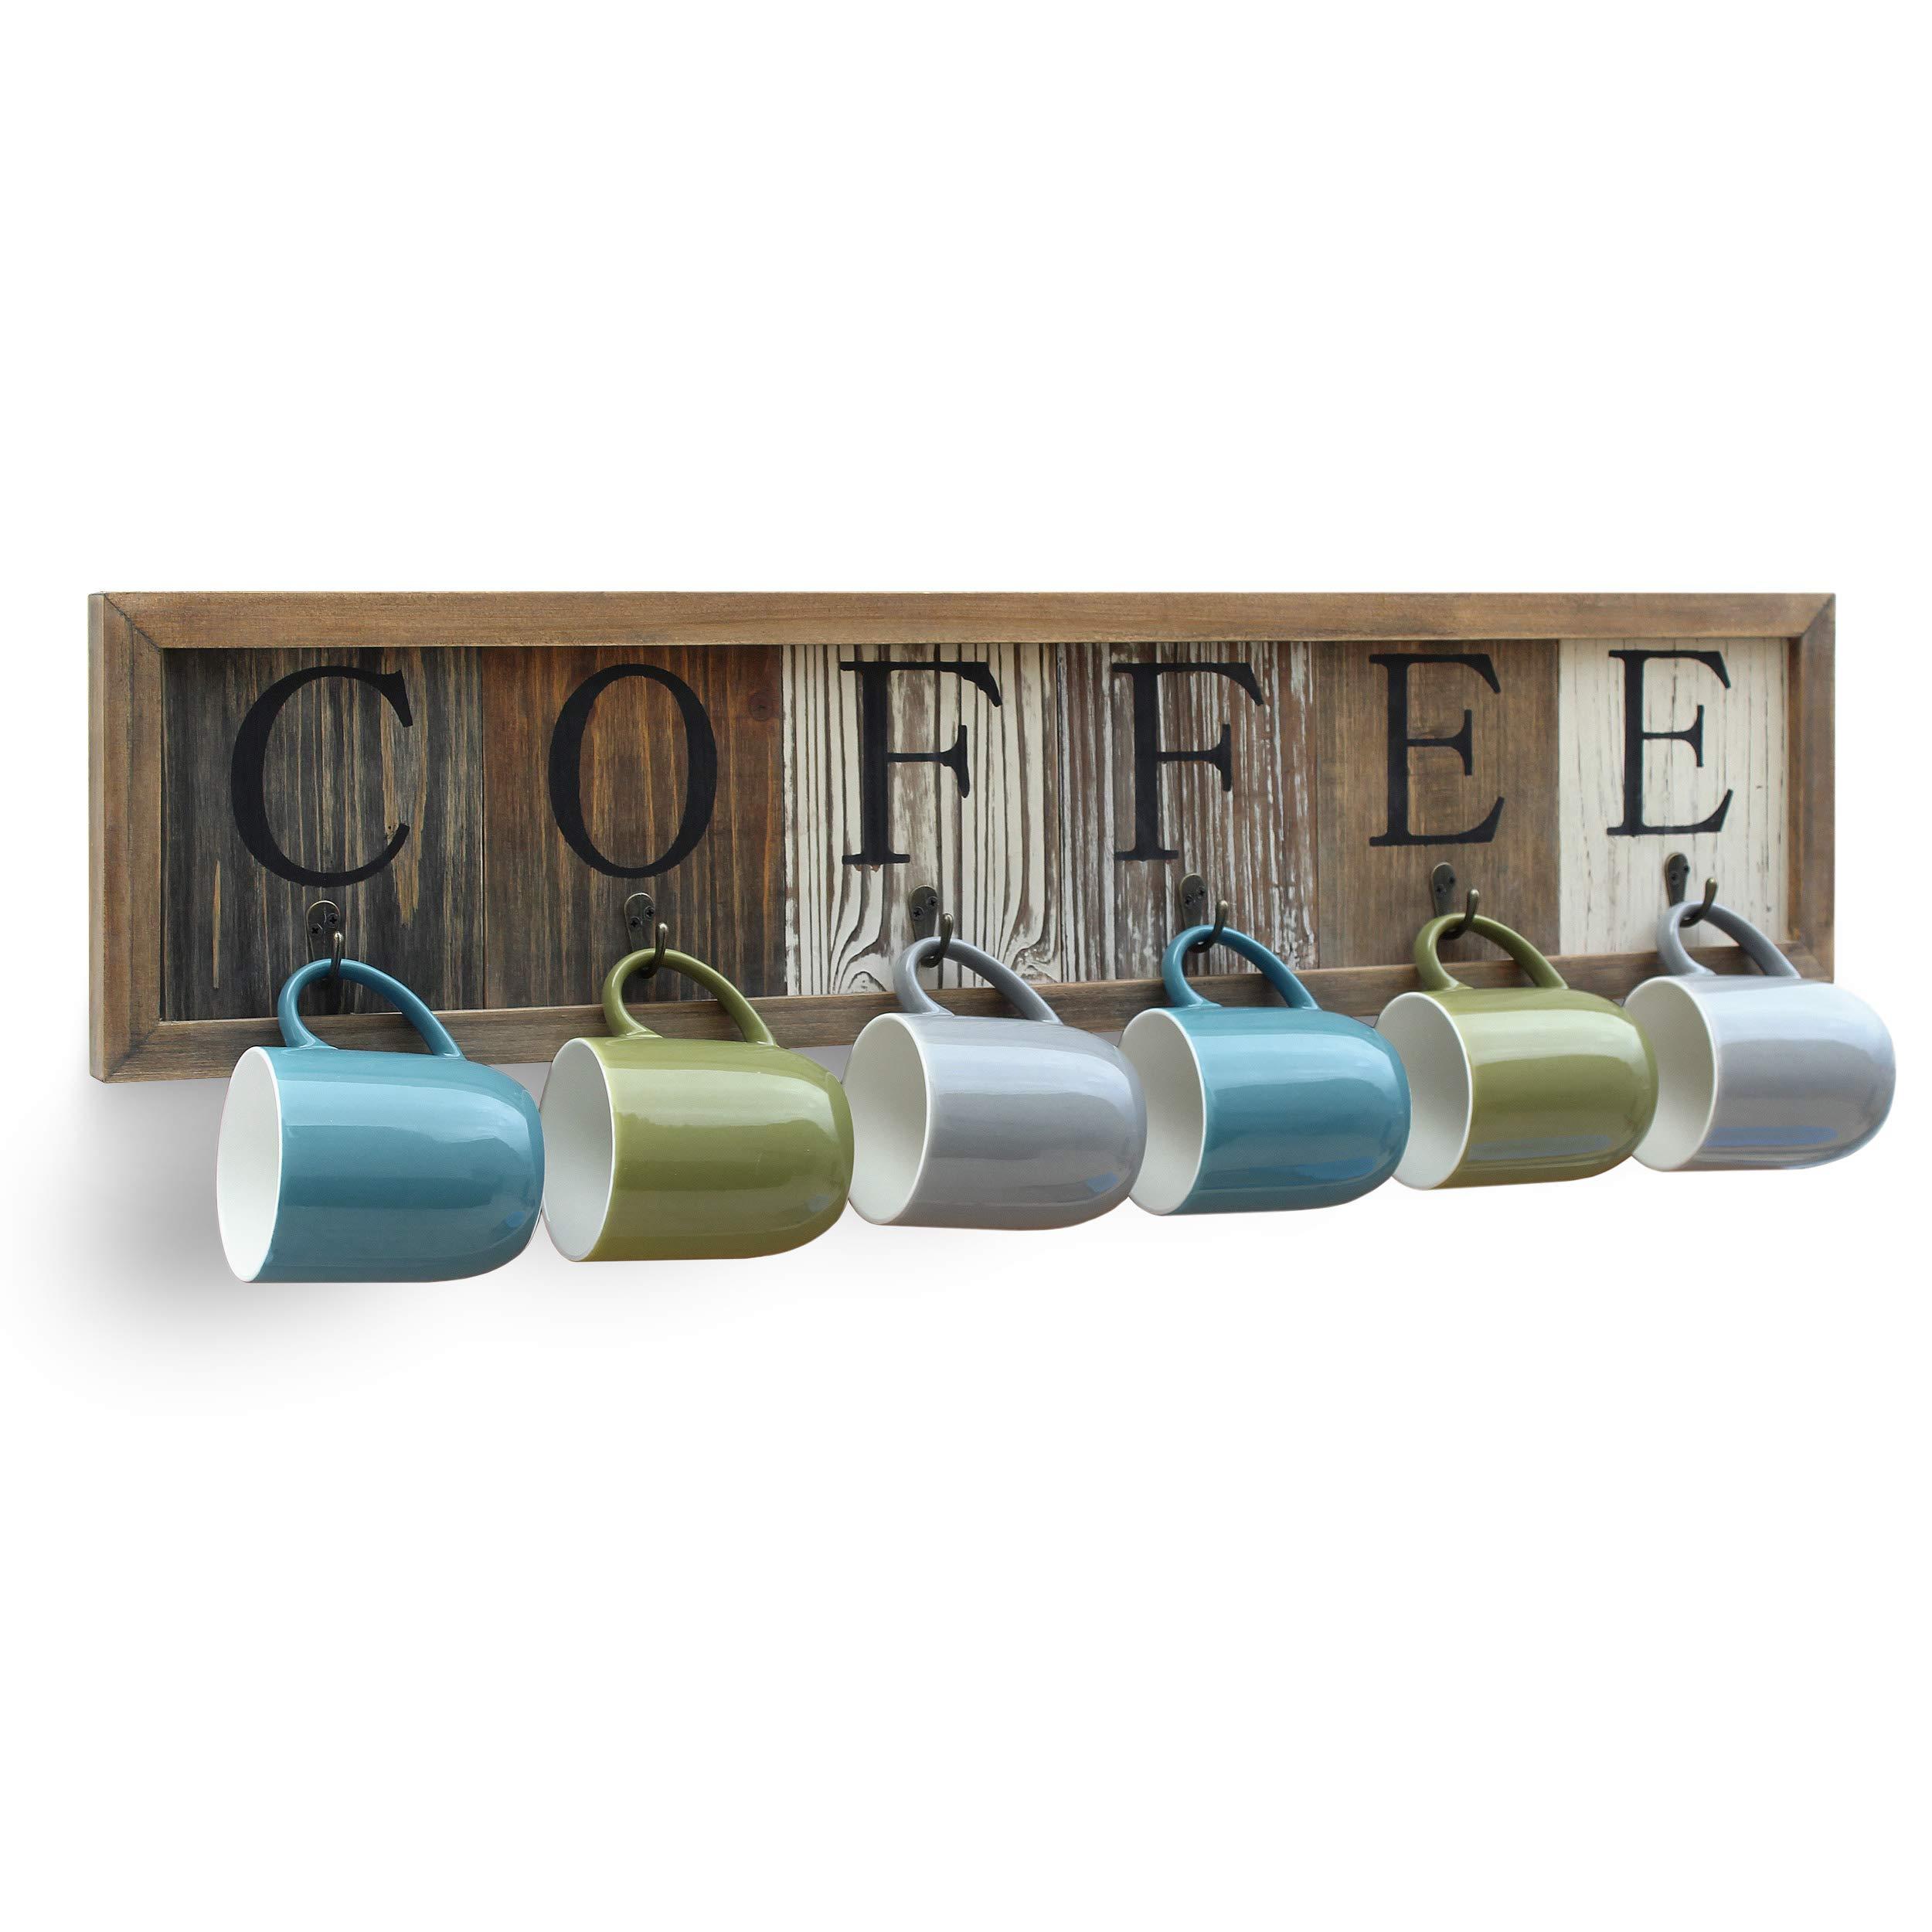 HBCY Creations Rustic Coffee Mug Rack Wall Mounted, Printed Coffee Sign - 6 Coffee Cup Hooks - Wooden Coffee Mug Display and Organizer - Distressed Coffee Rack Sign (31.5'') by HBCY Creations